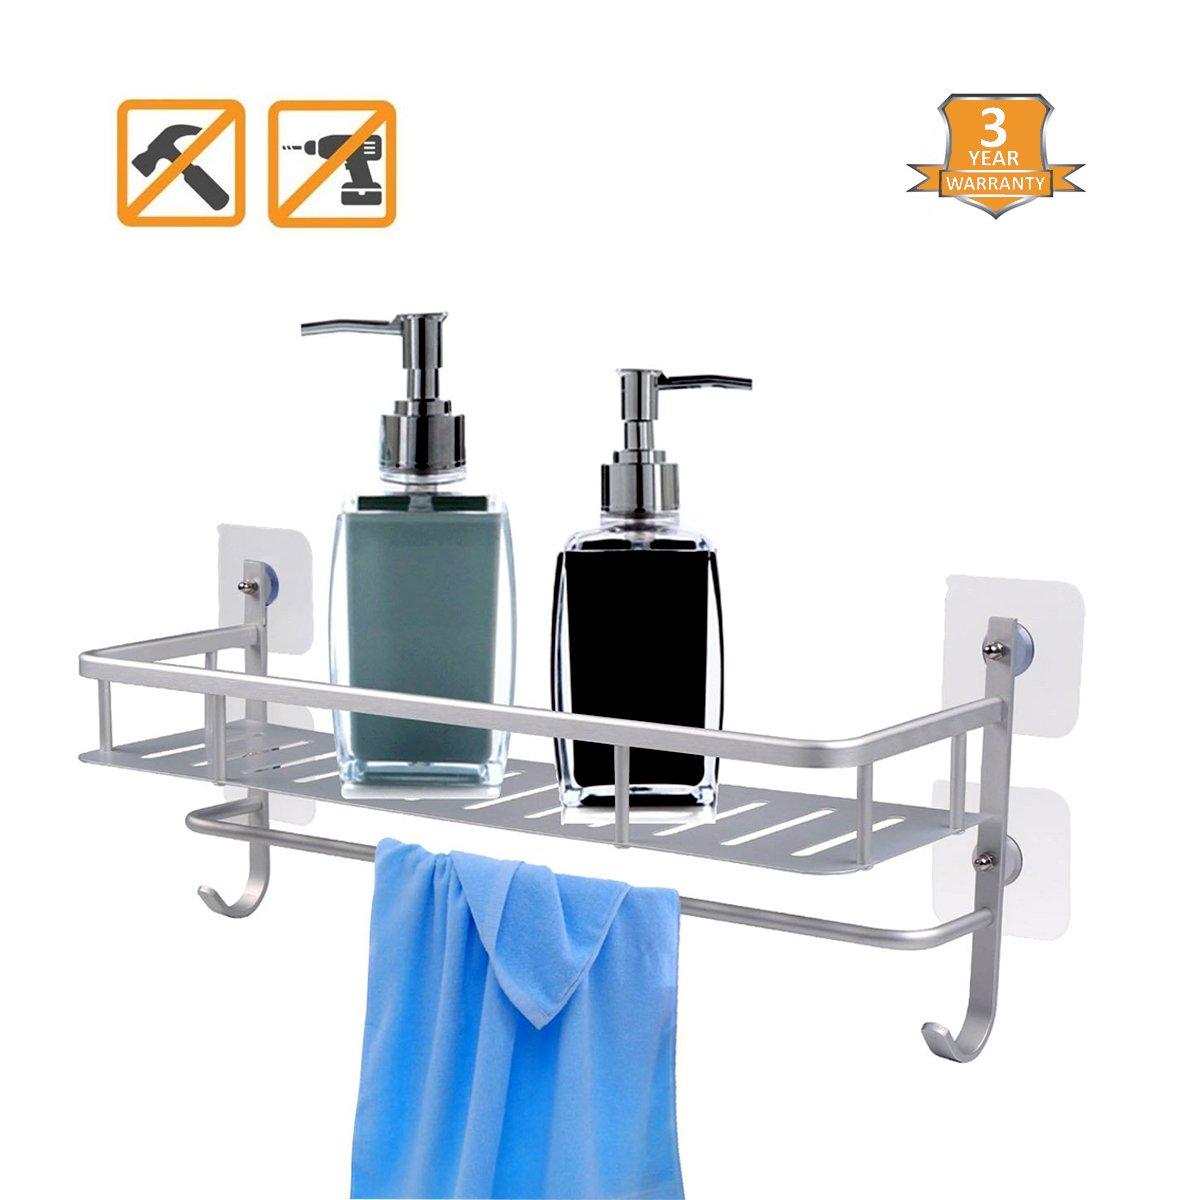 Bathroom Shelf Shower Caddy, Self Adhesive Shelf, No Drilling Anti-Rust Aluminum Shower Storage Shampoo holder Shelves with Towel Rack Hanger Hooks